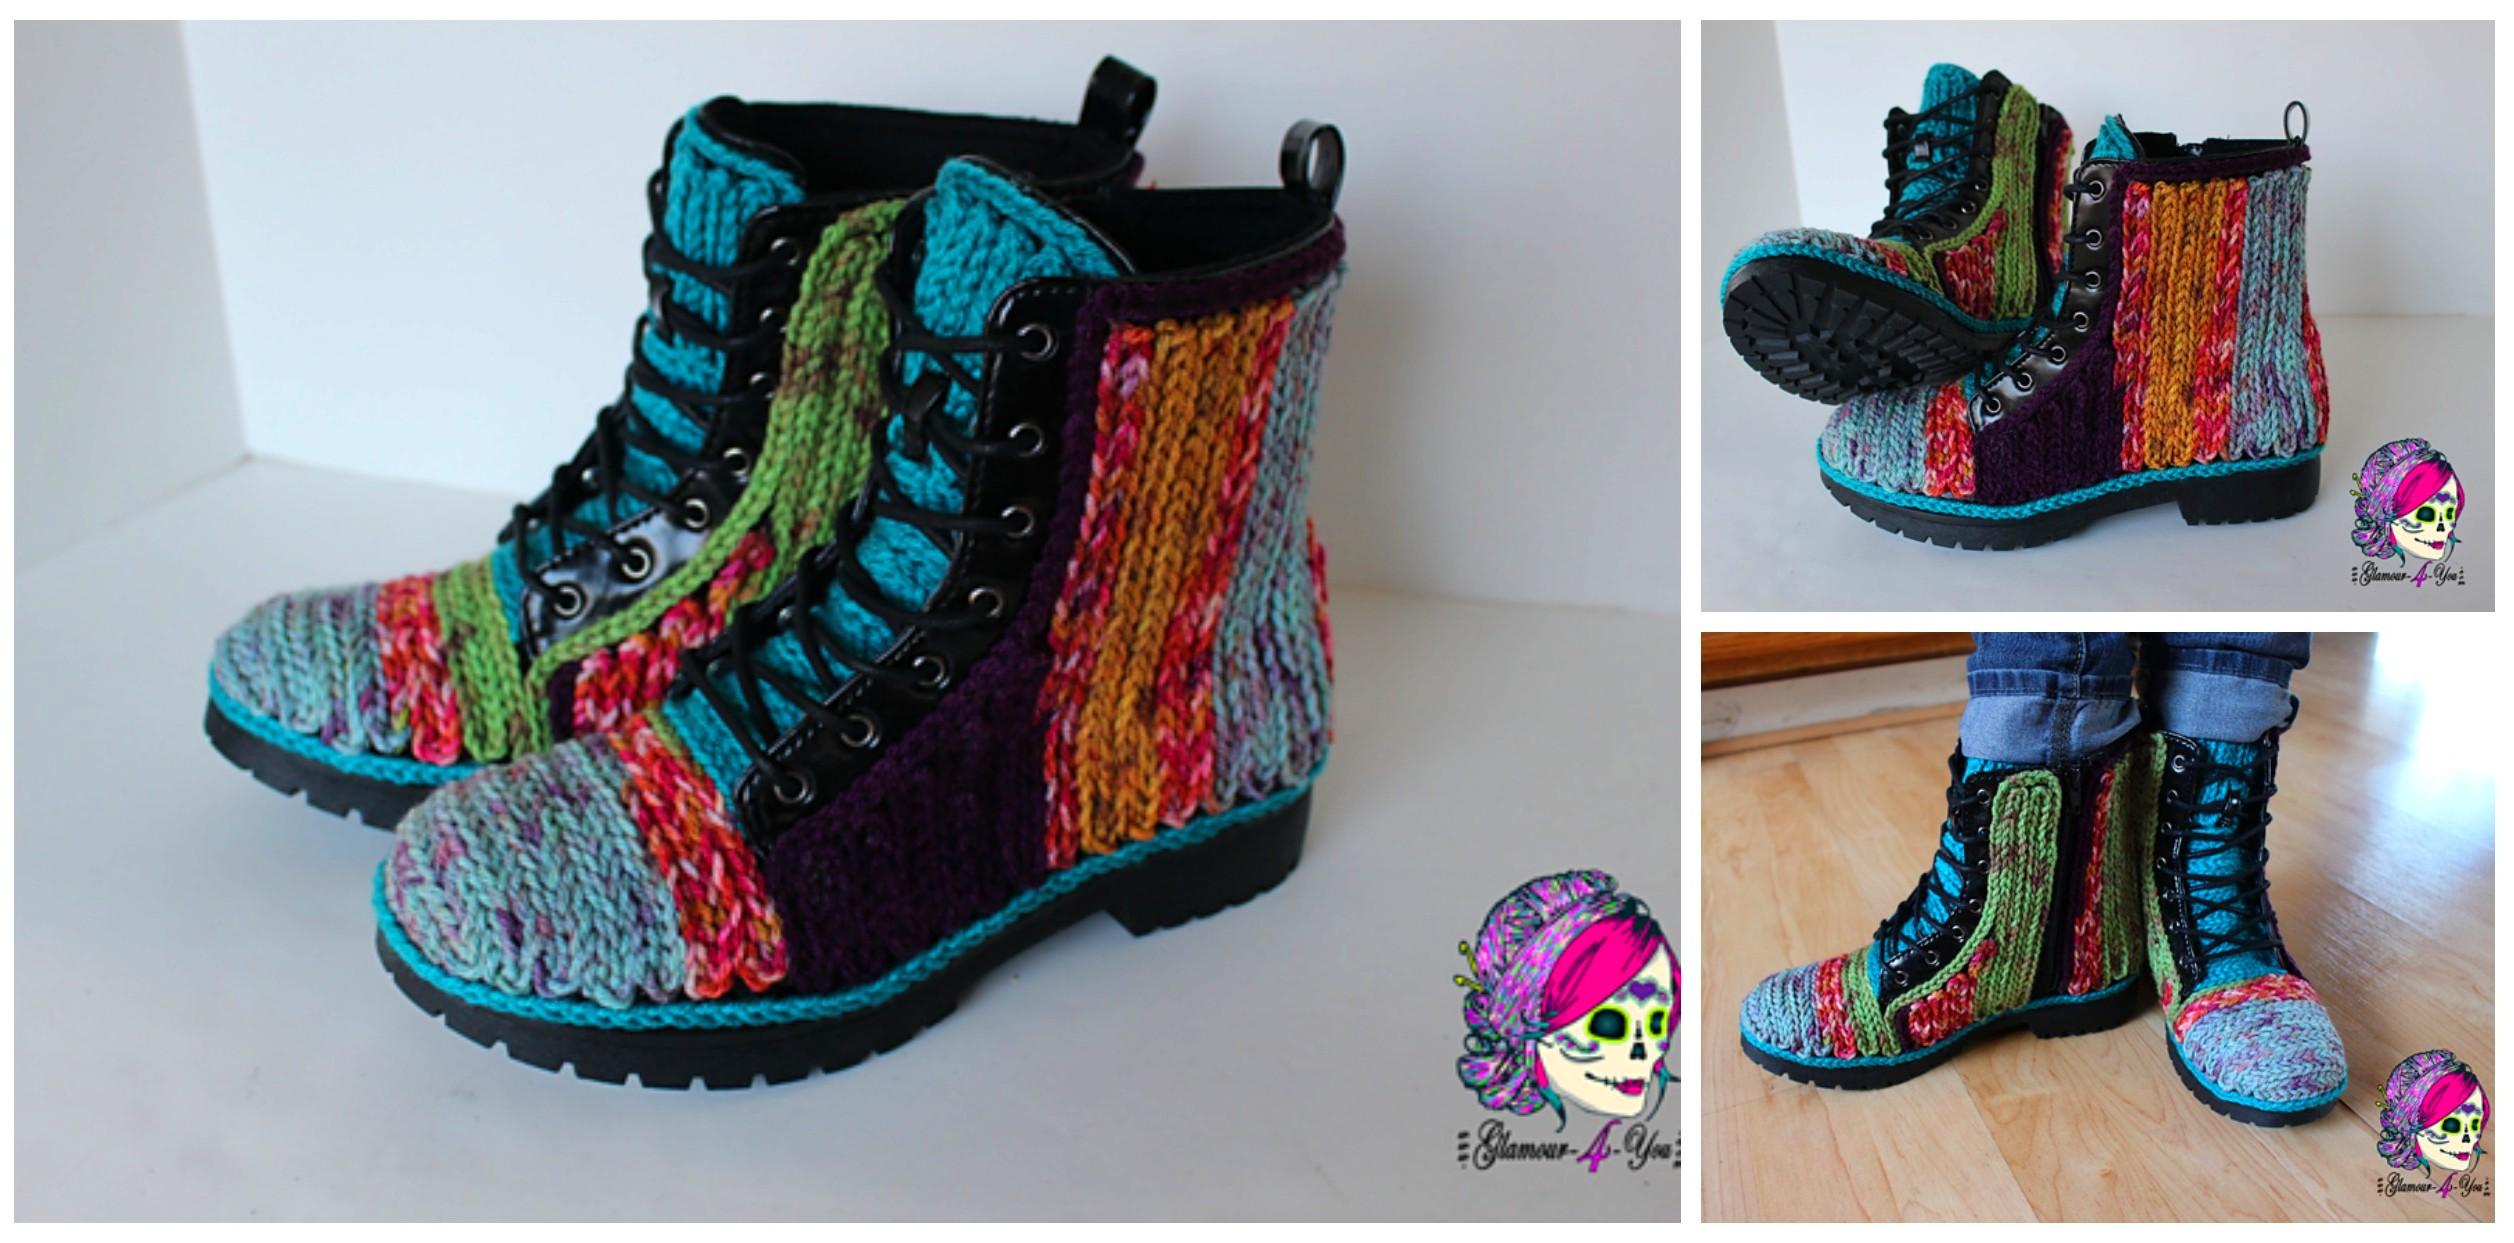 Creative Outdoor Boots